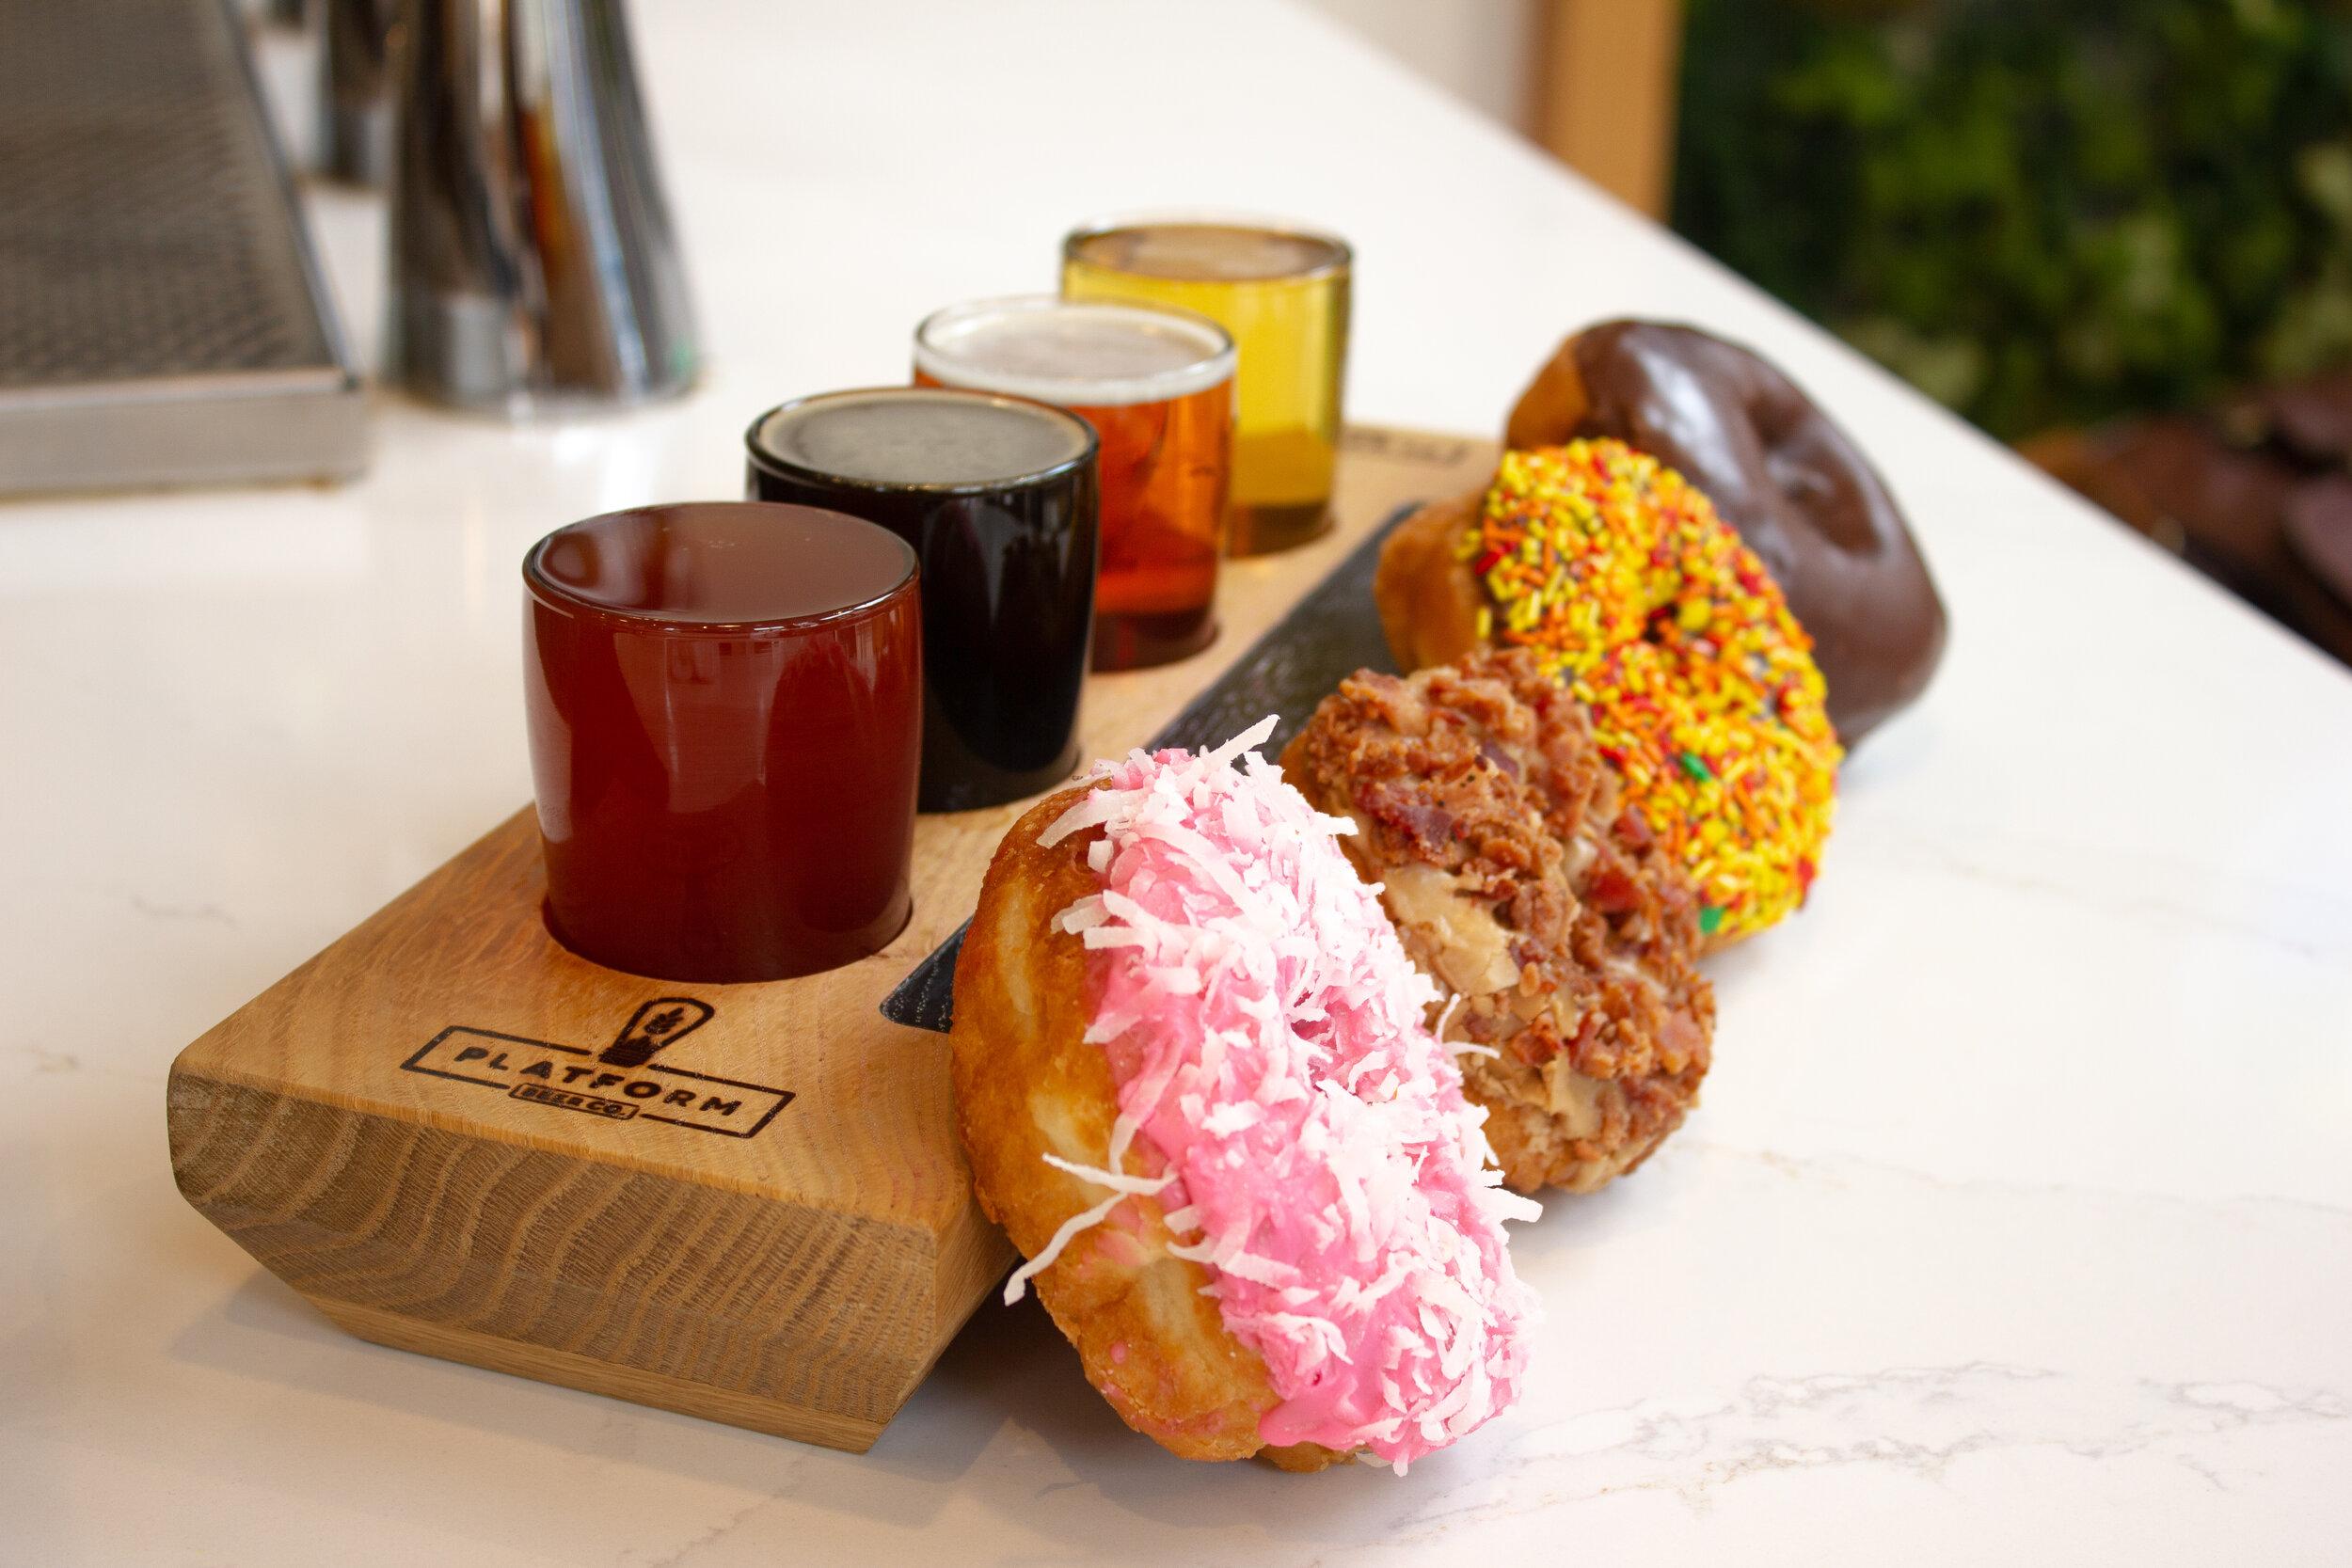 Holtman's Donuts x LOCOBA Beer Pairing